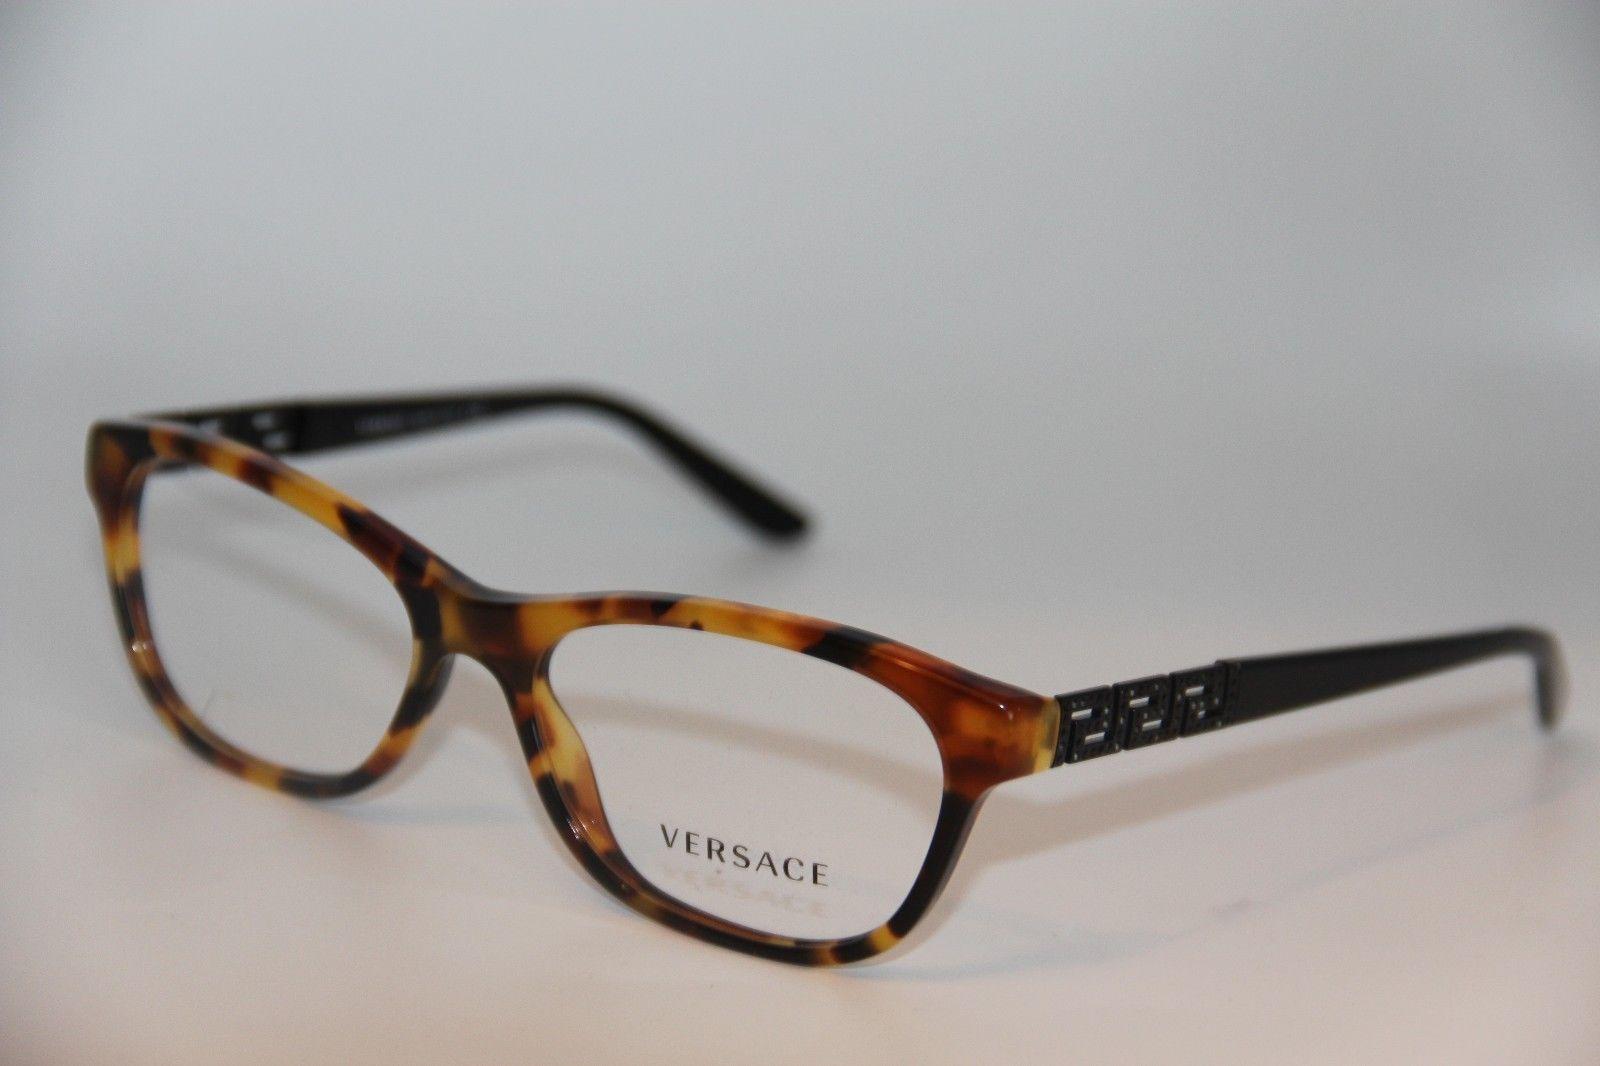 9bacbb5a34c6 New Versace Mod. 3212-B 5119 Tortoise and 50 similar items